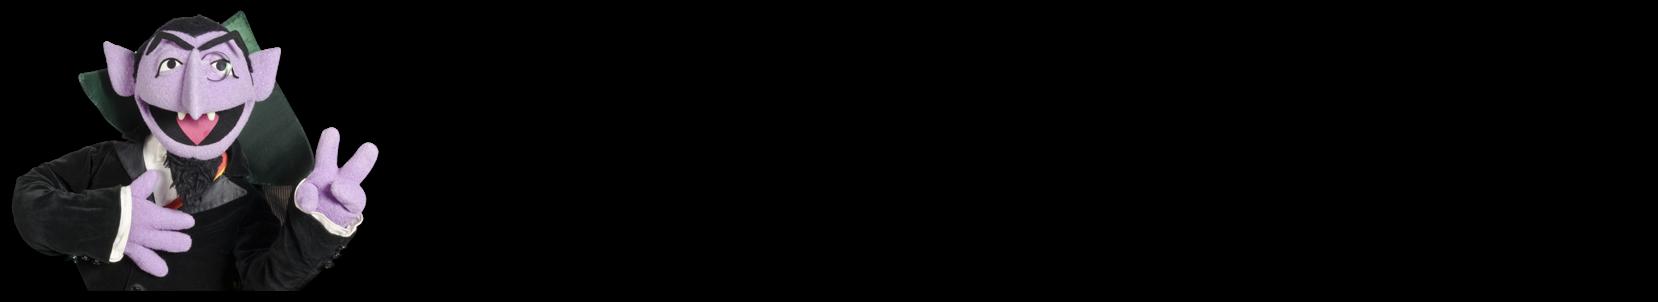 low effort logo